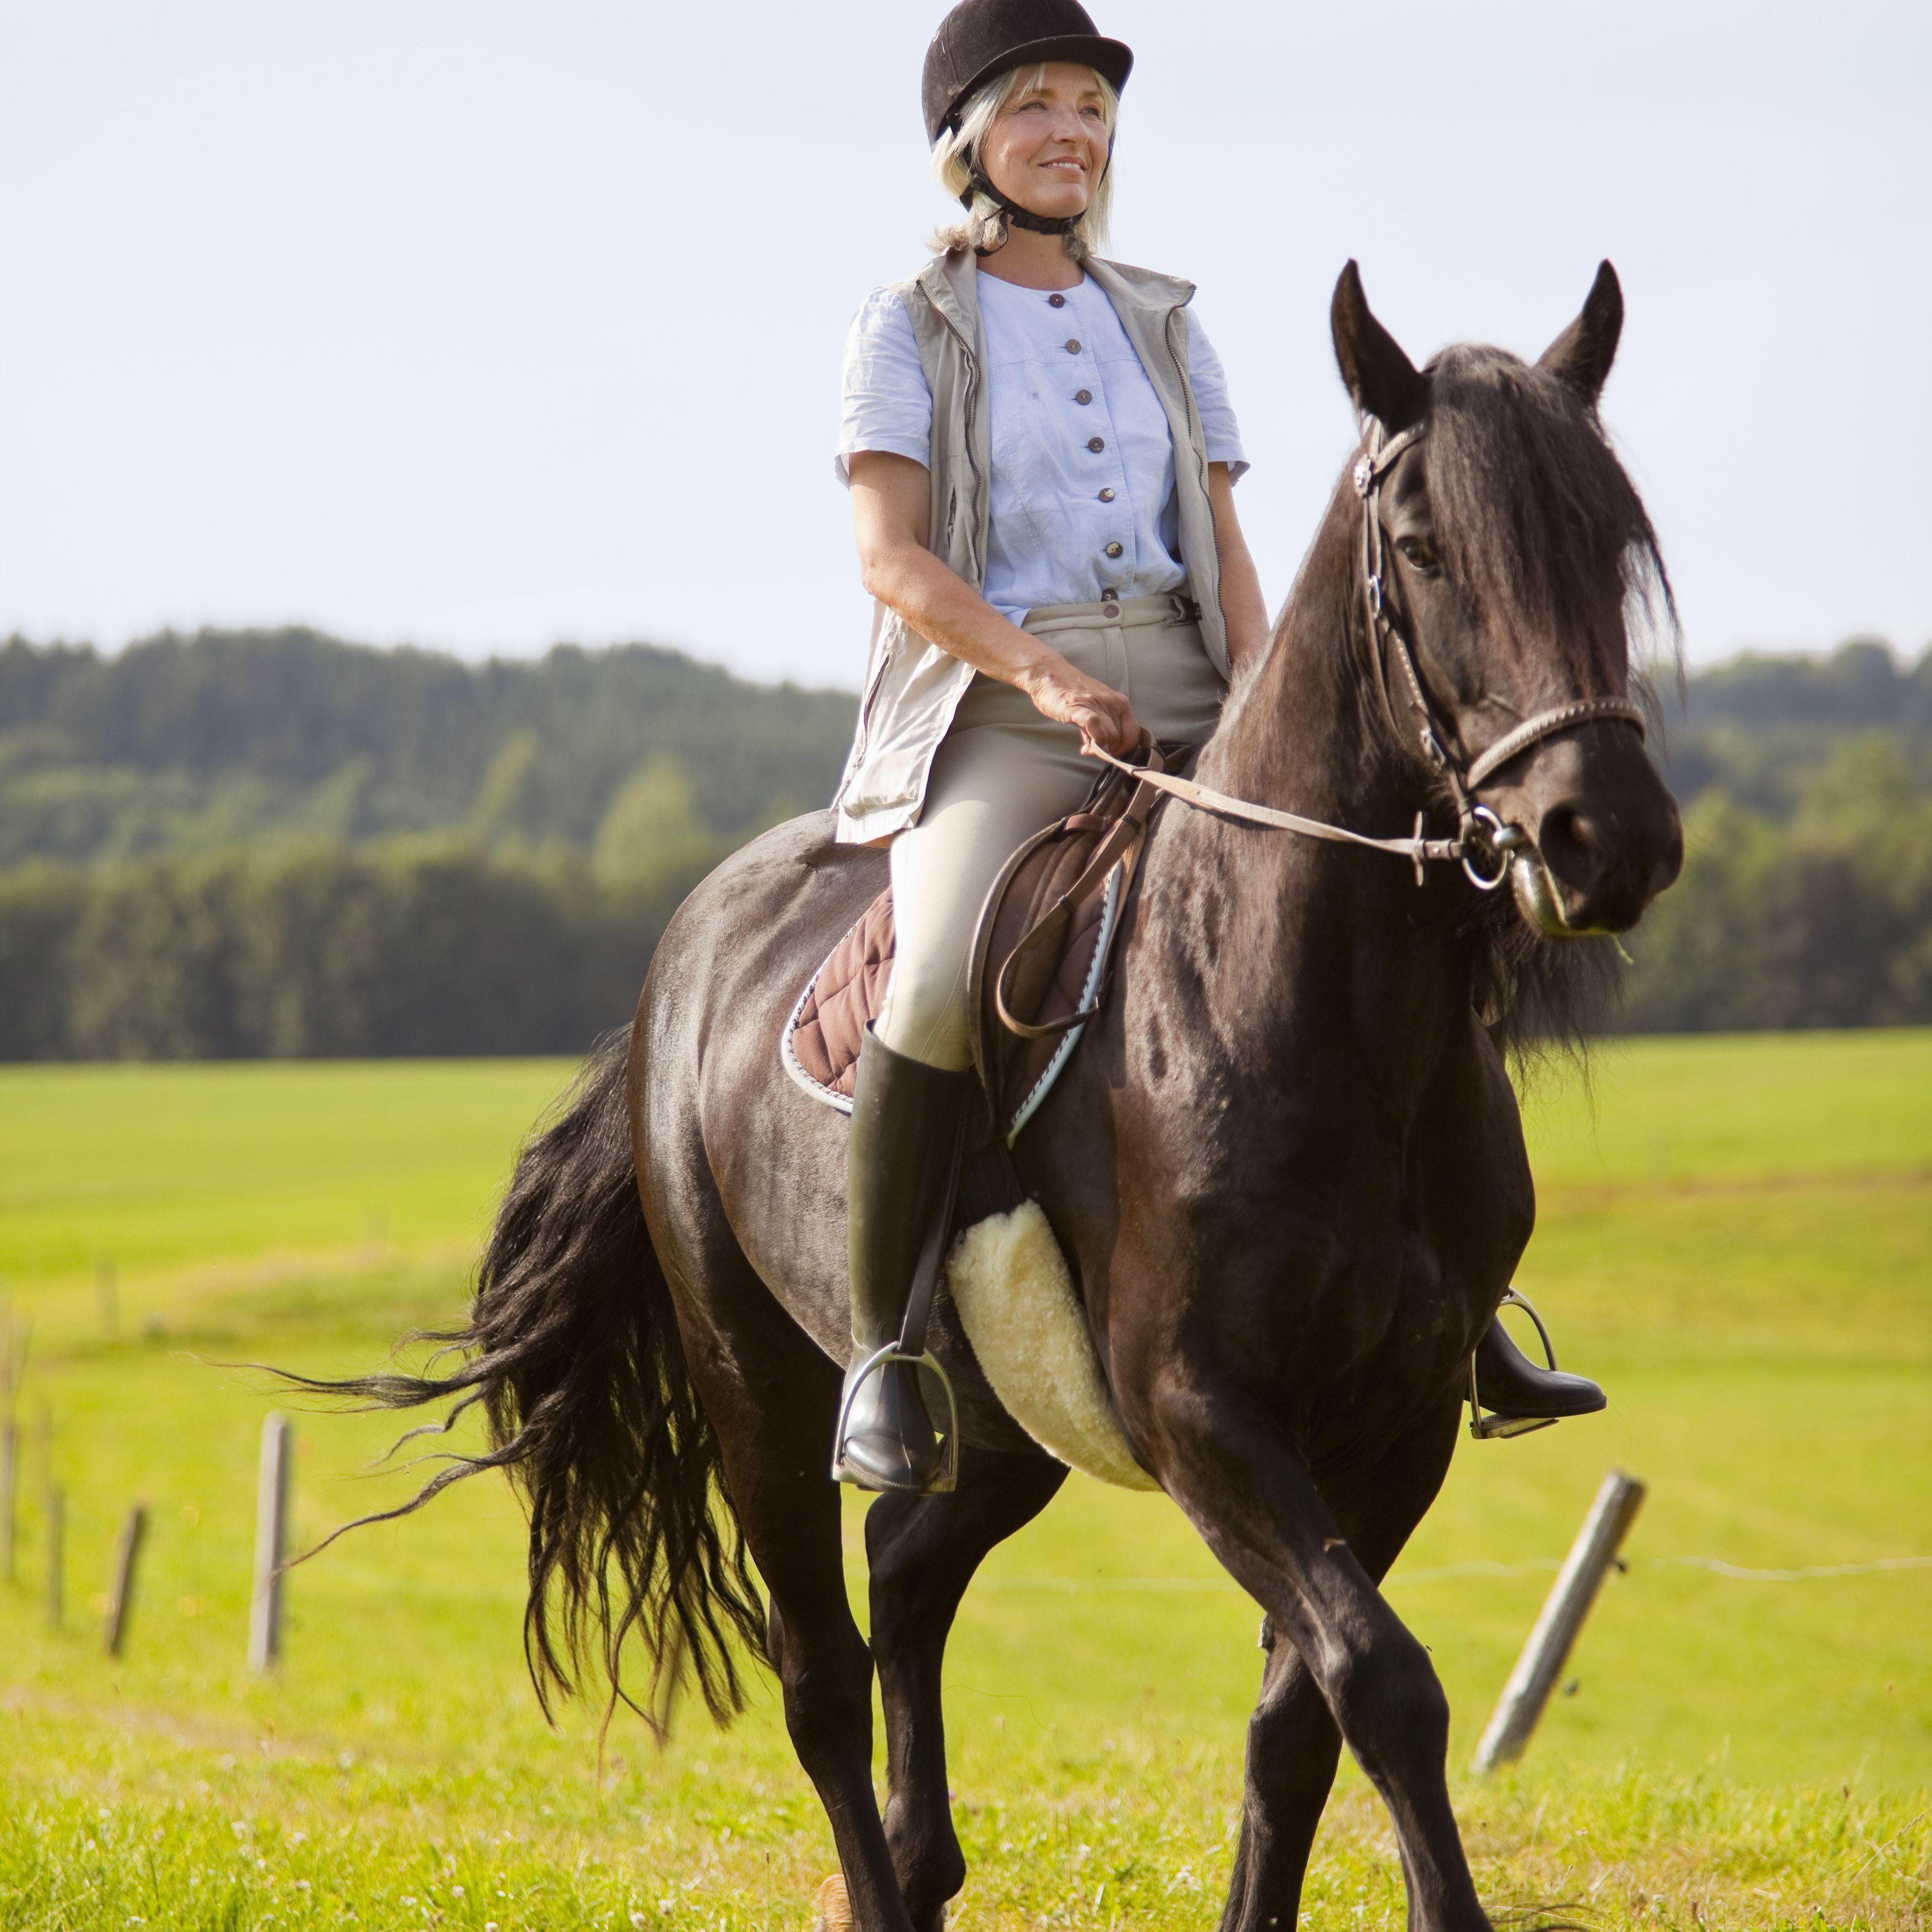 Alemania, Baviera, mujer madura montando a caballo